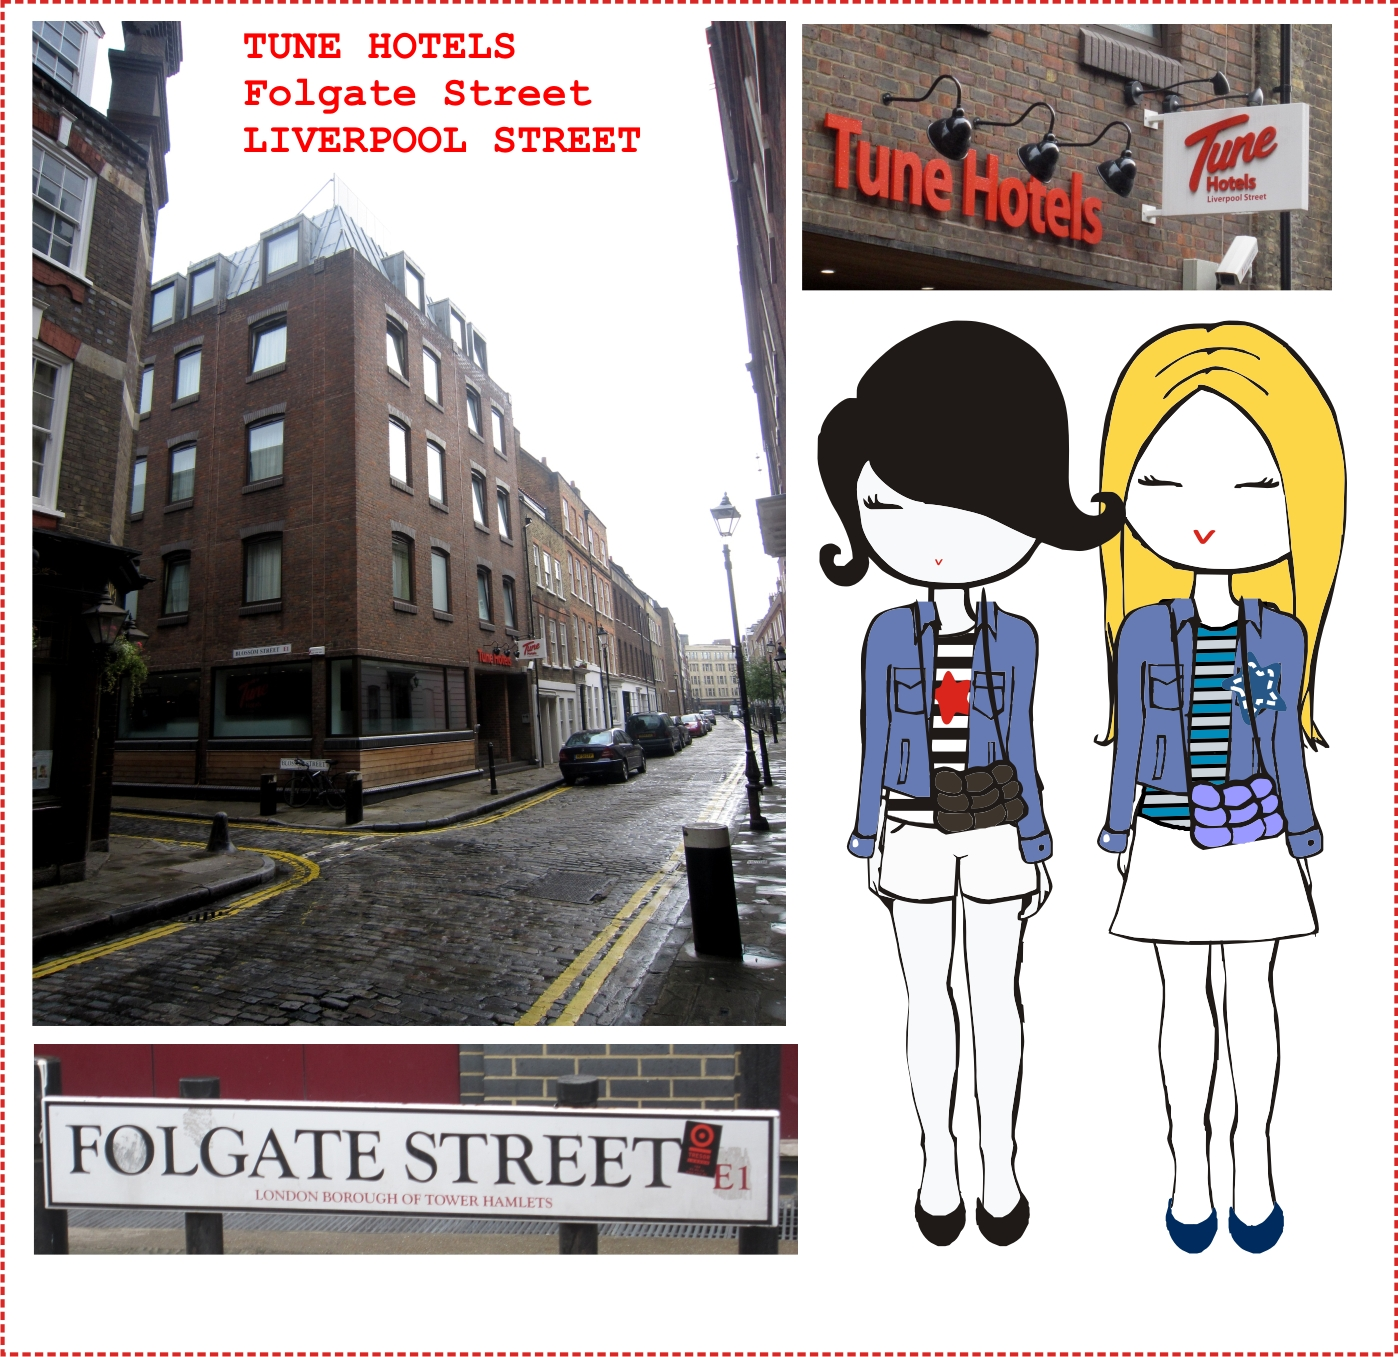 Tune Hotel Liverpool Towels: Los Viajes De Lolita Chiq: LONDRES 2013 BY LOLITA CHIQ